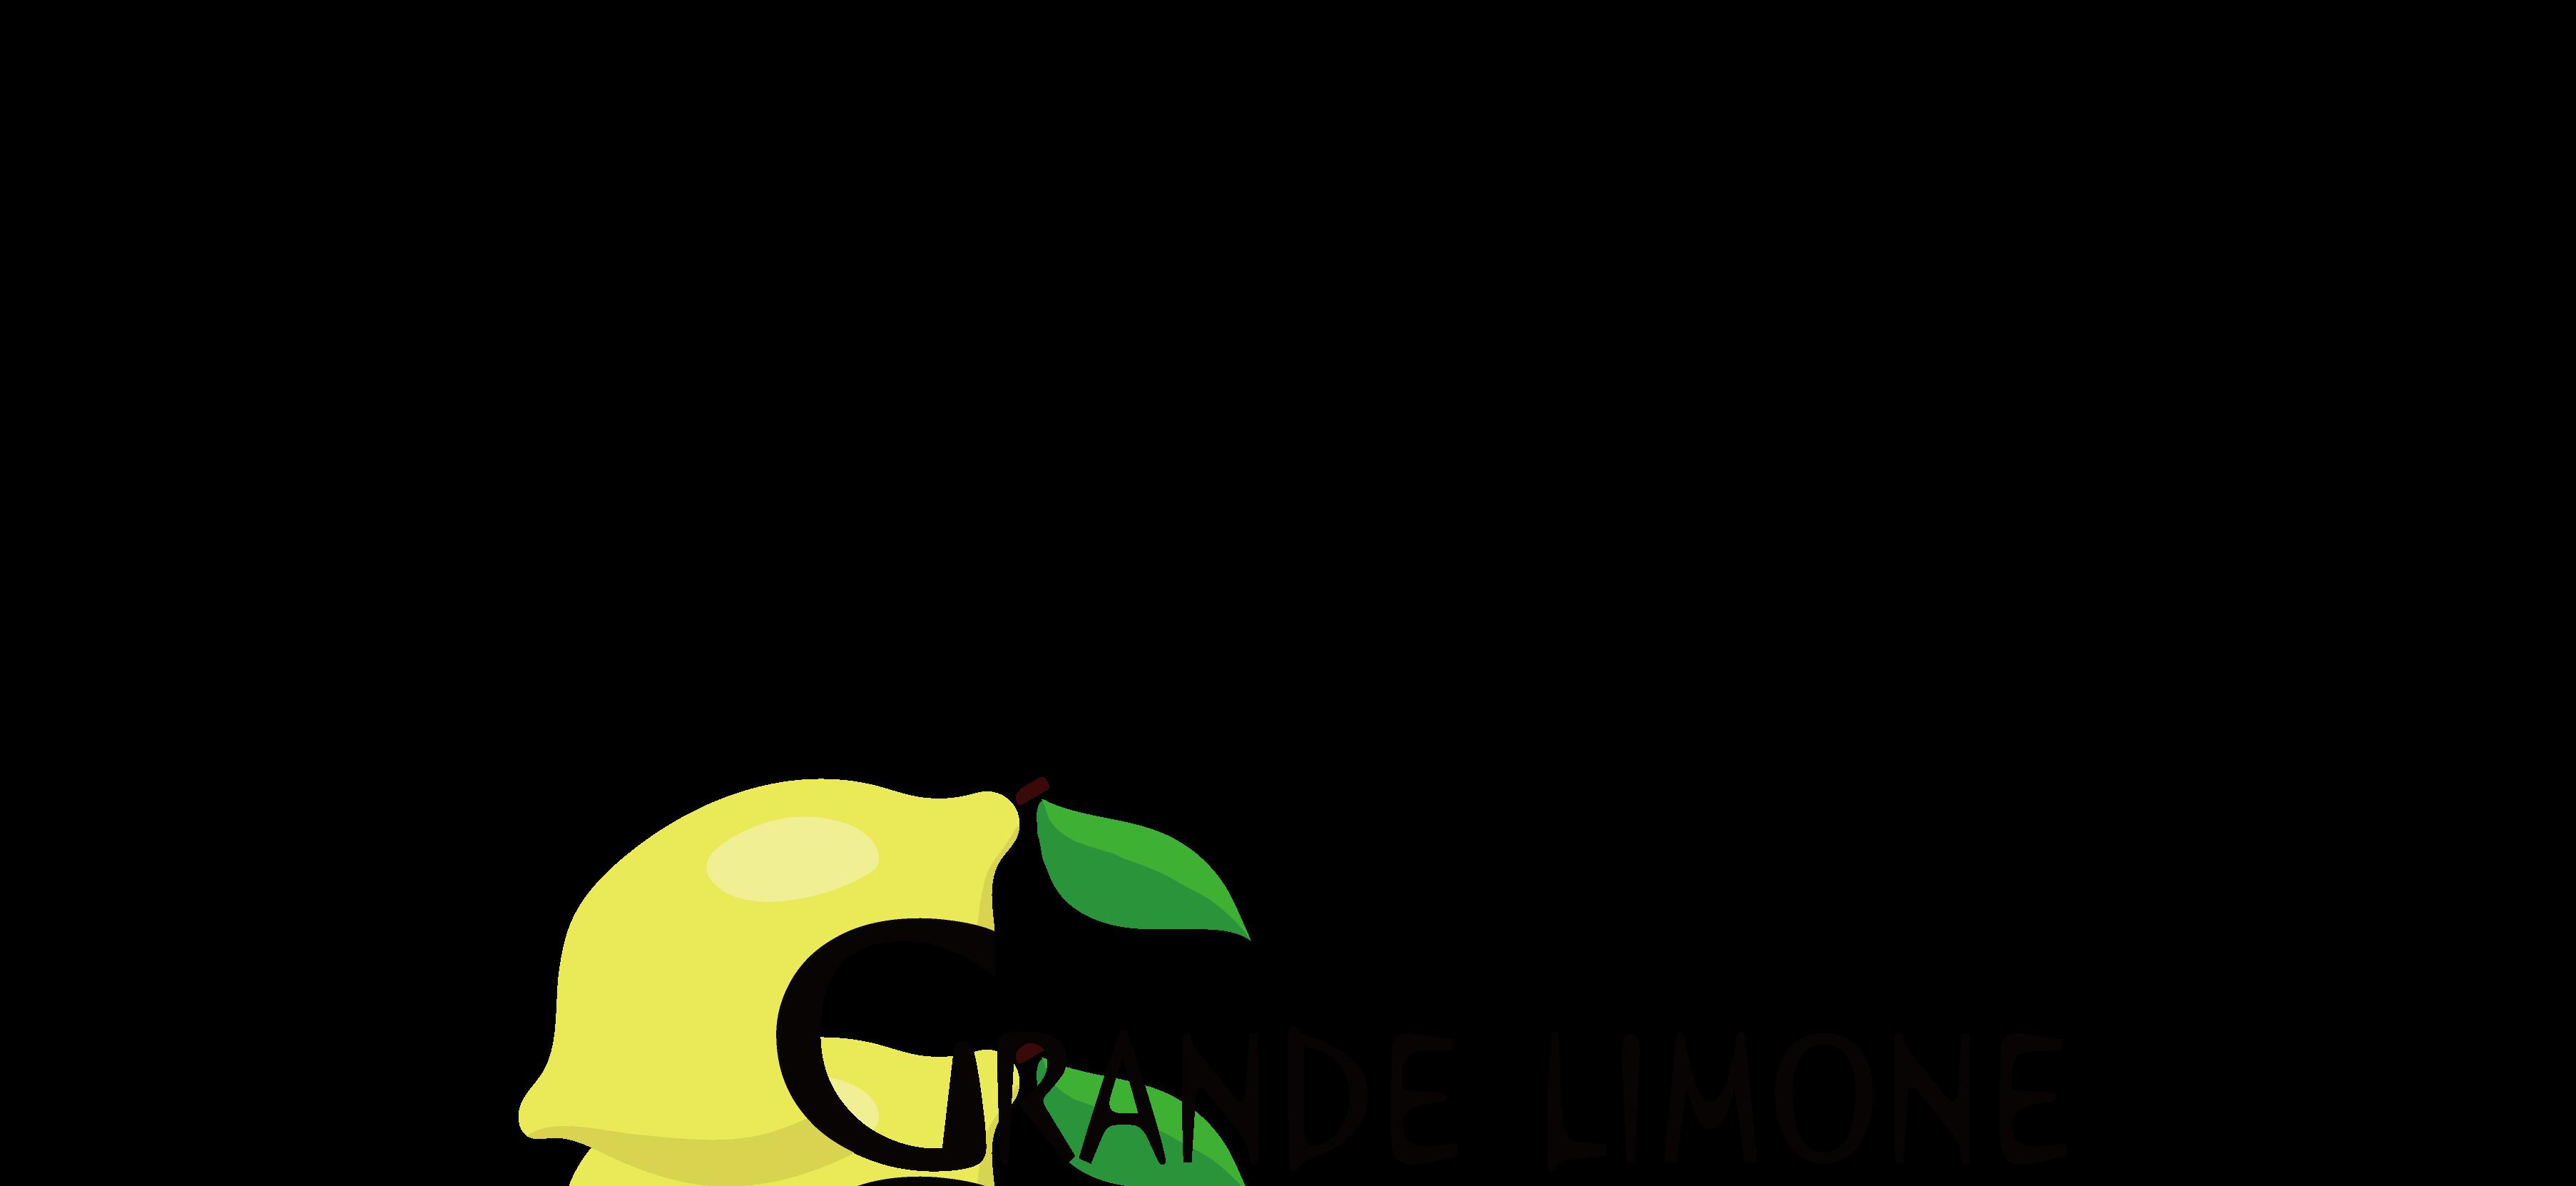 檸檬屋 ONLINESHOP